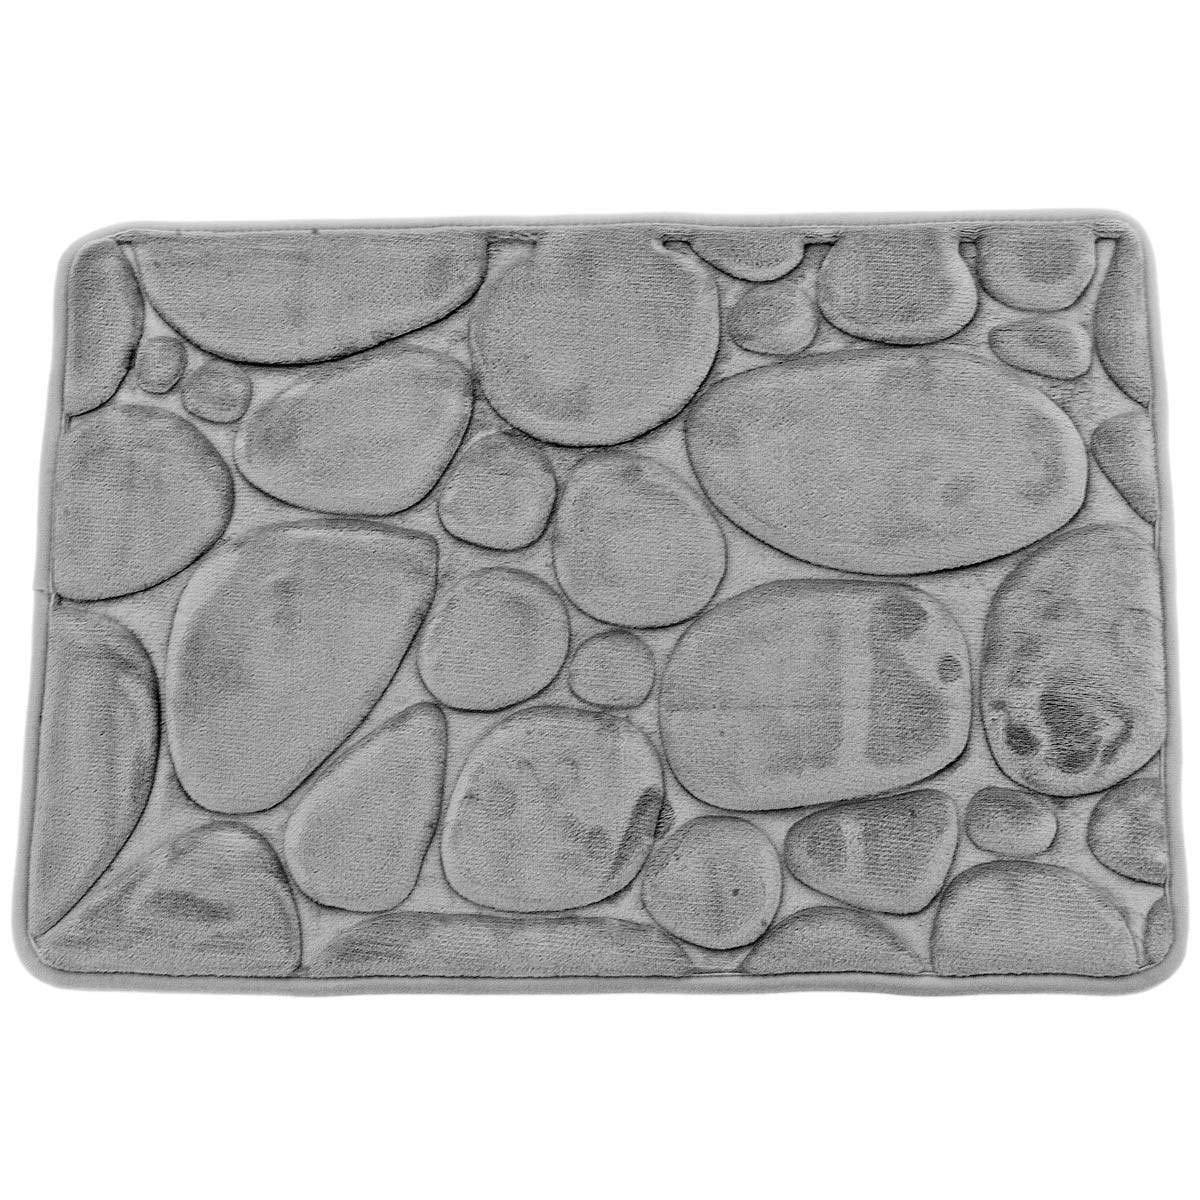 43x61 Alfombra Micro Sensoft Memoire de forma piedras Aqua Sea